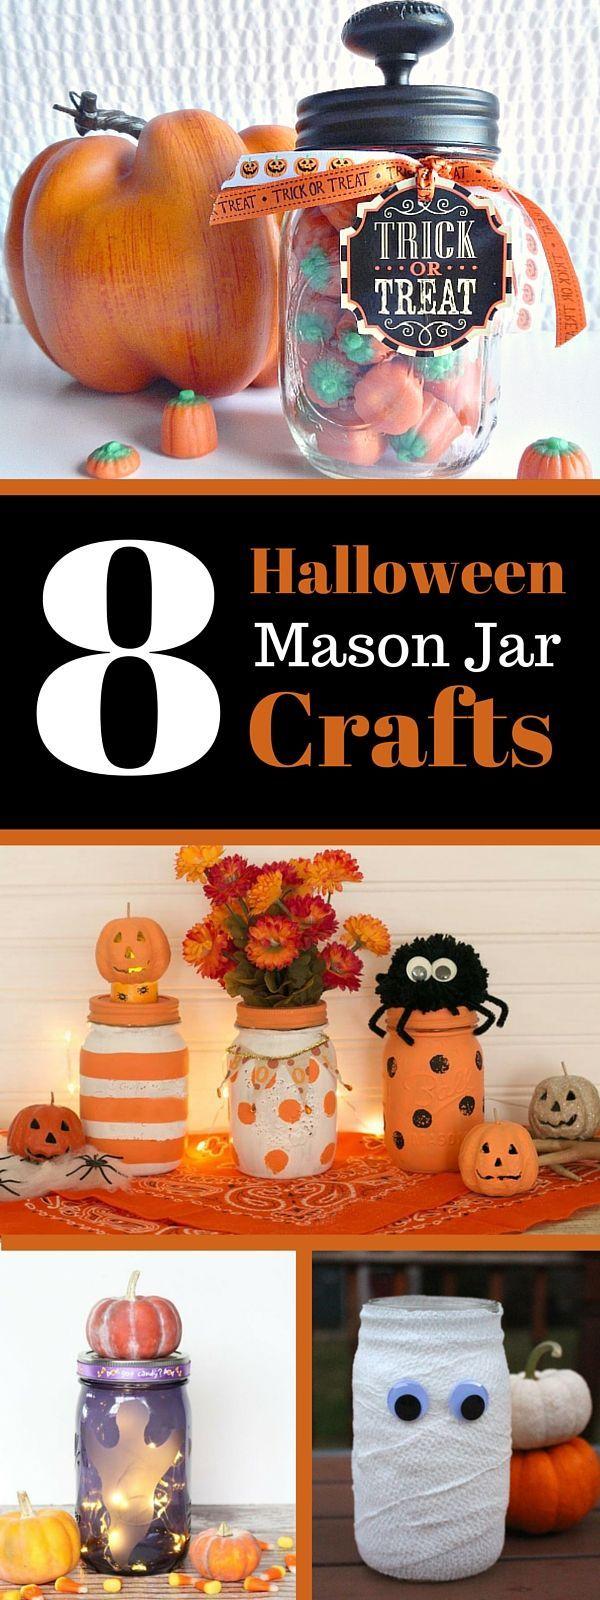 37 best Halloween Crafts images on Pinterest | Halloween decorations ...